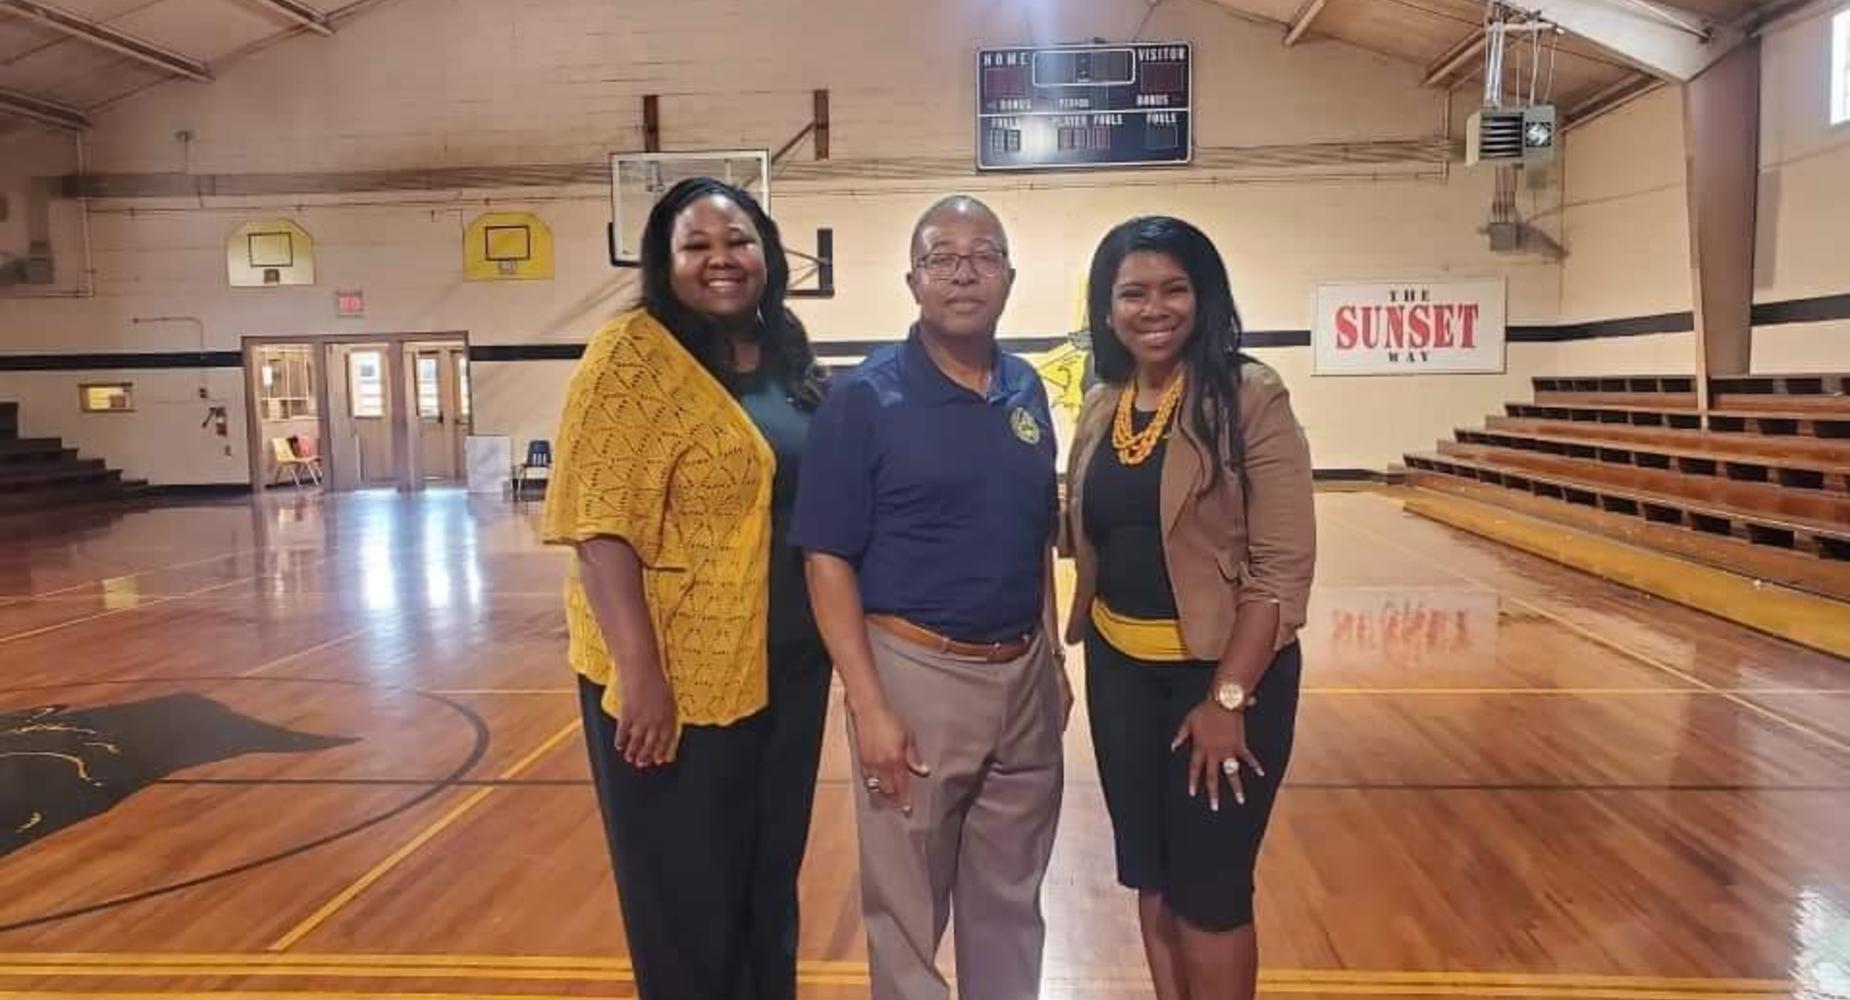 Principal Marquet S. Rideau, Superintendent Patrick Jenkins, and Assistant Principal Sherika Simon